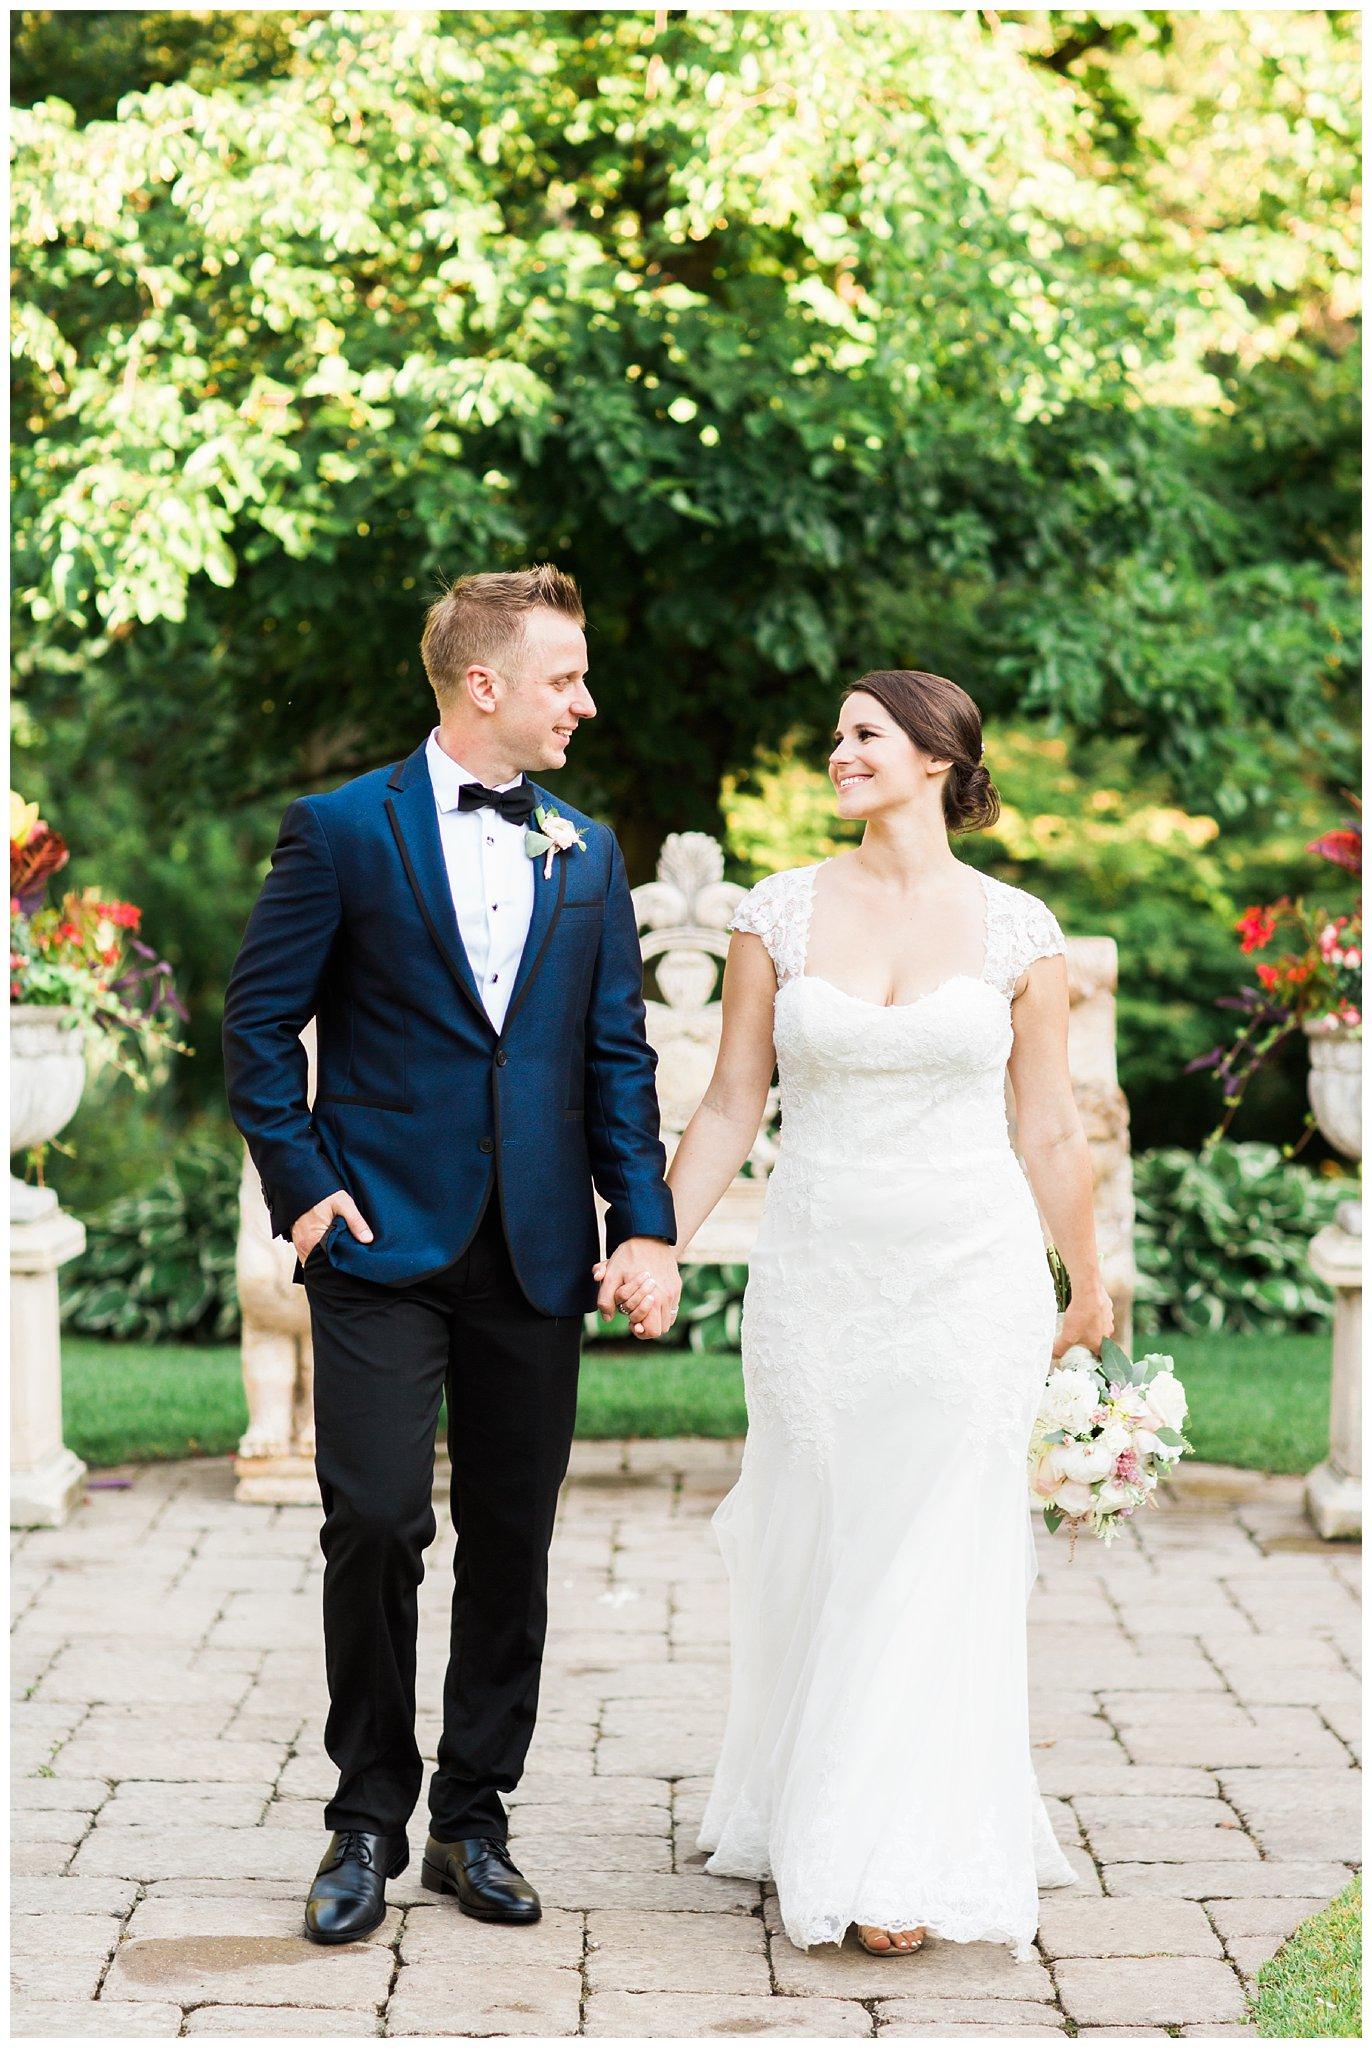 Alicia&Kurt_RavisloeCountryClubWedding_Chicagoweddingphotographer_RebeccaHaleyPhotography_0167.jpg